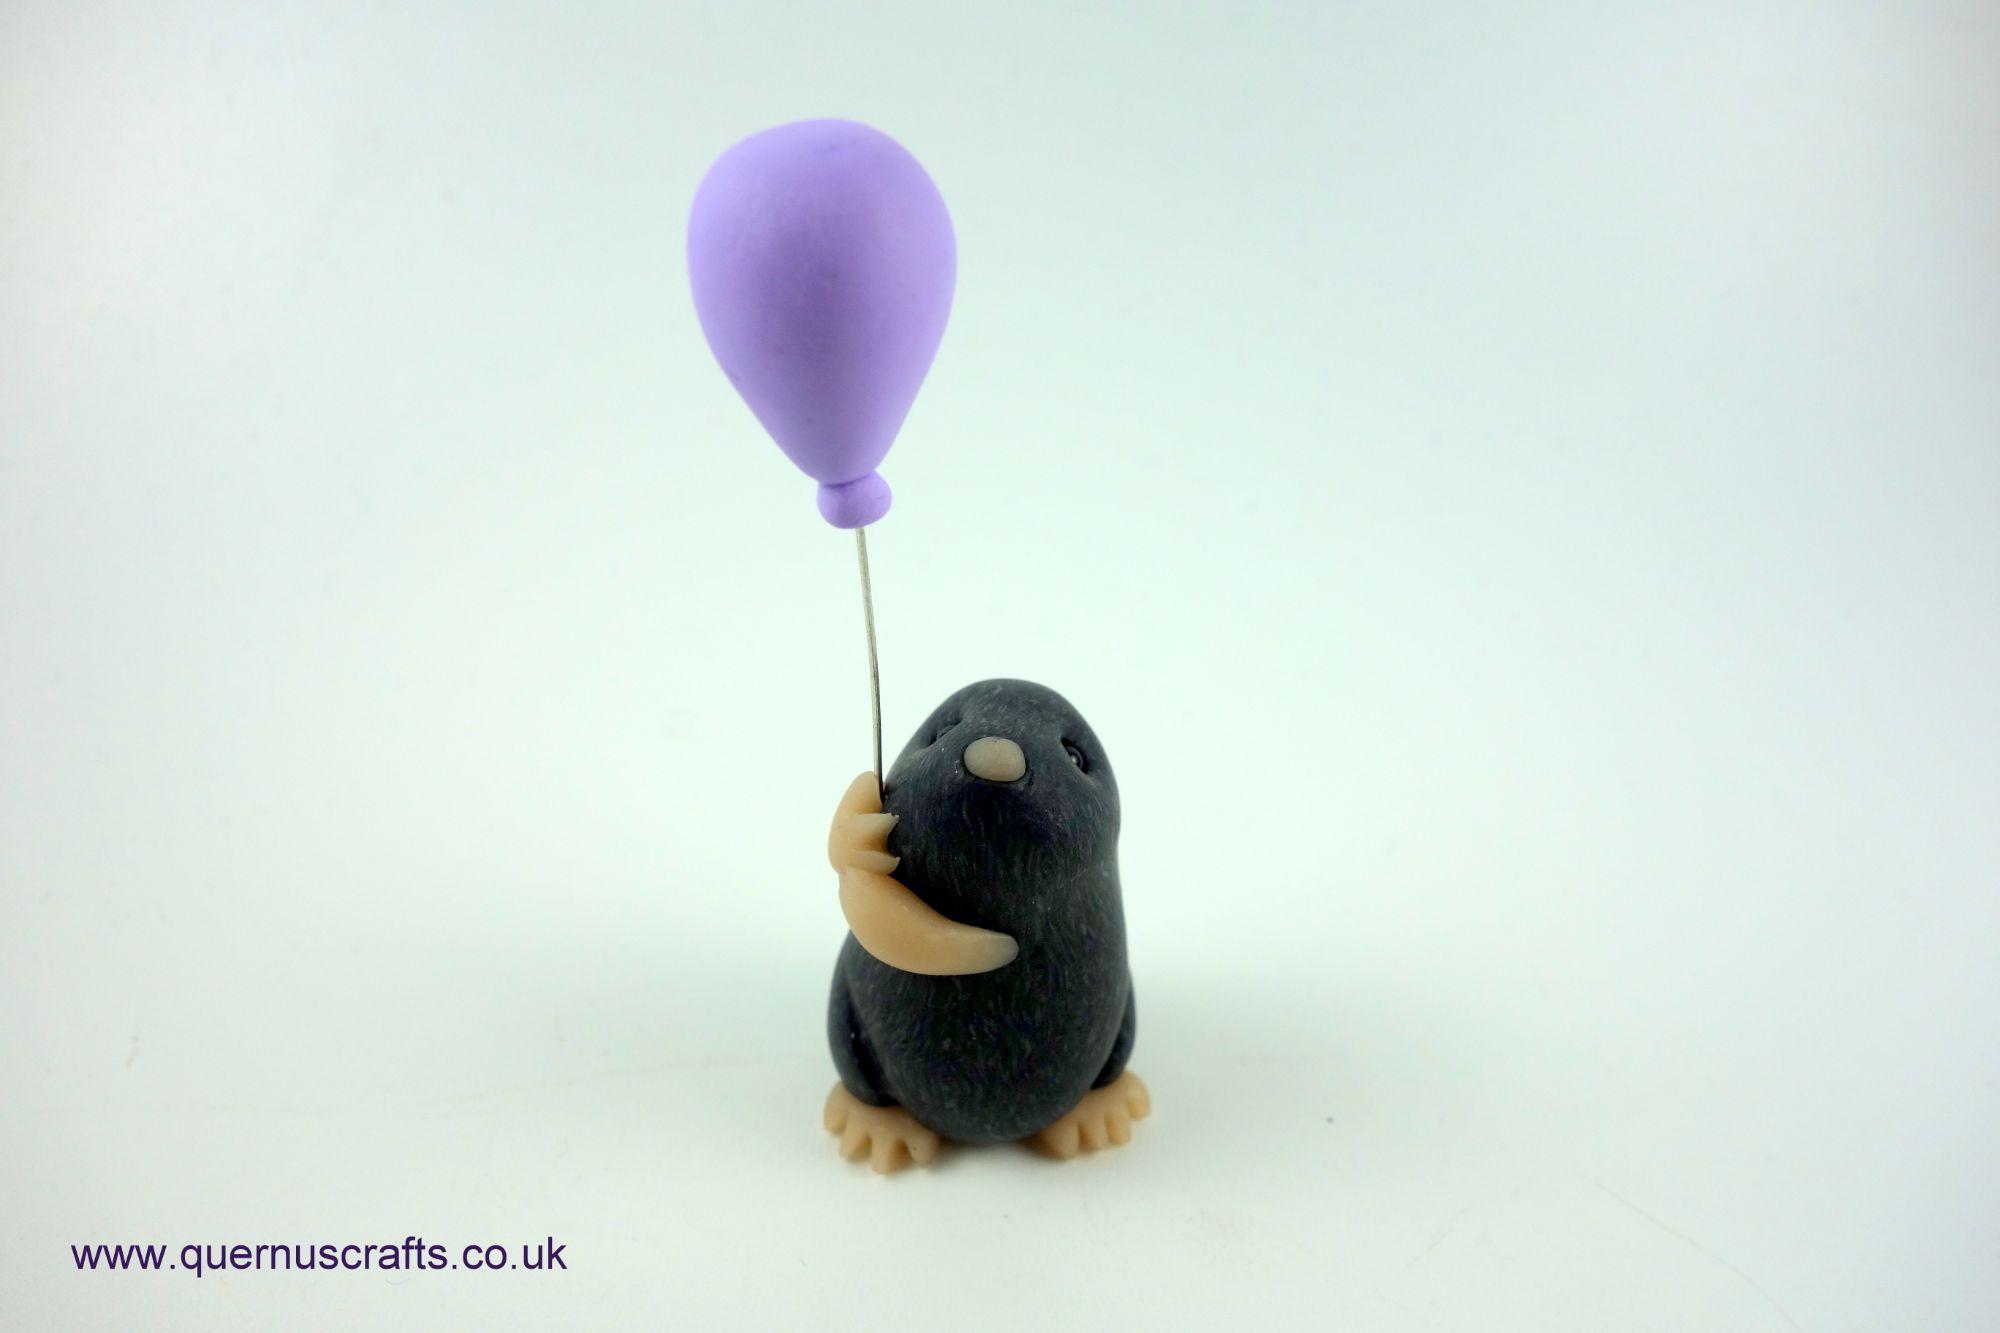 Wee Lilac Balloon Mole